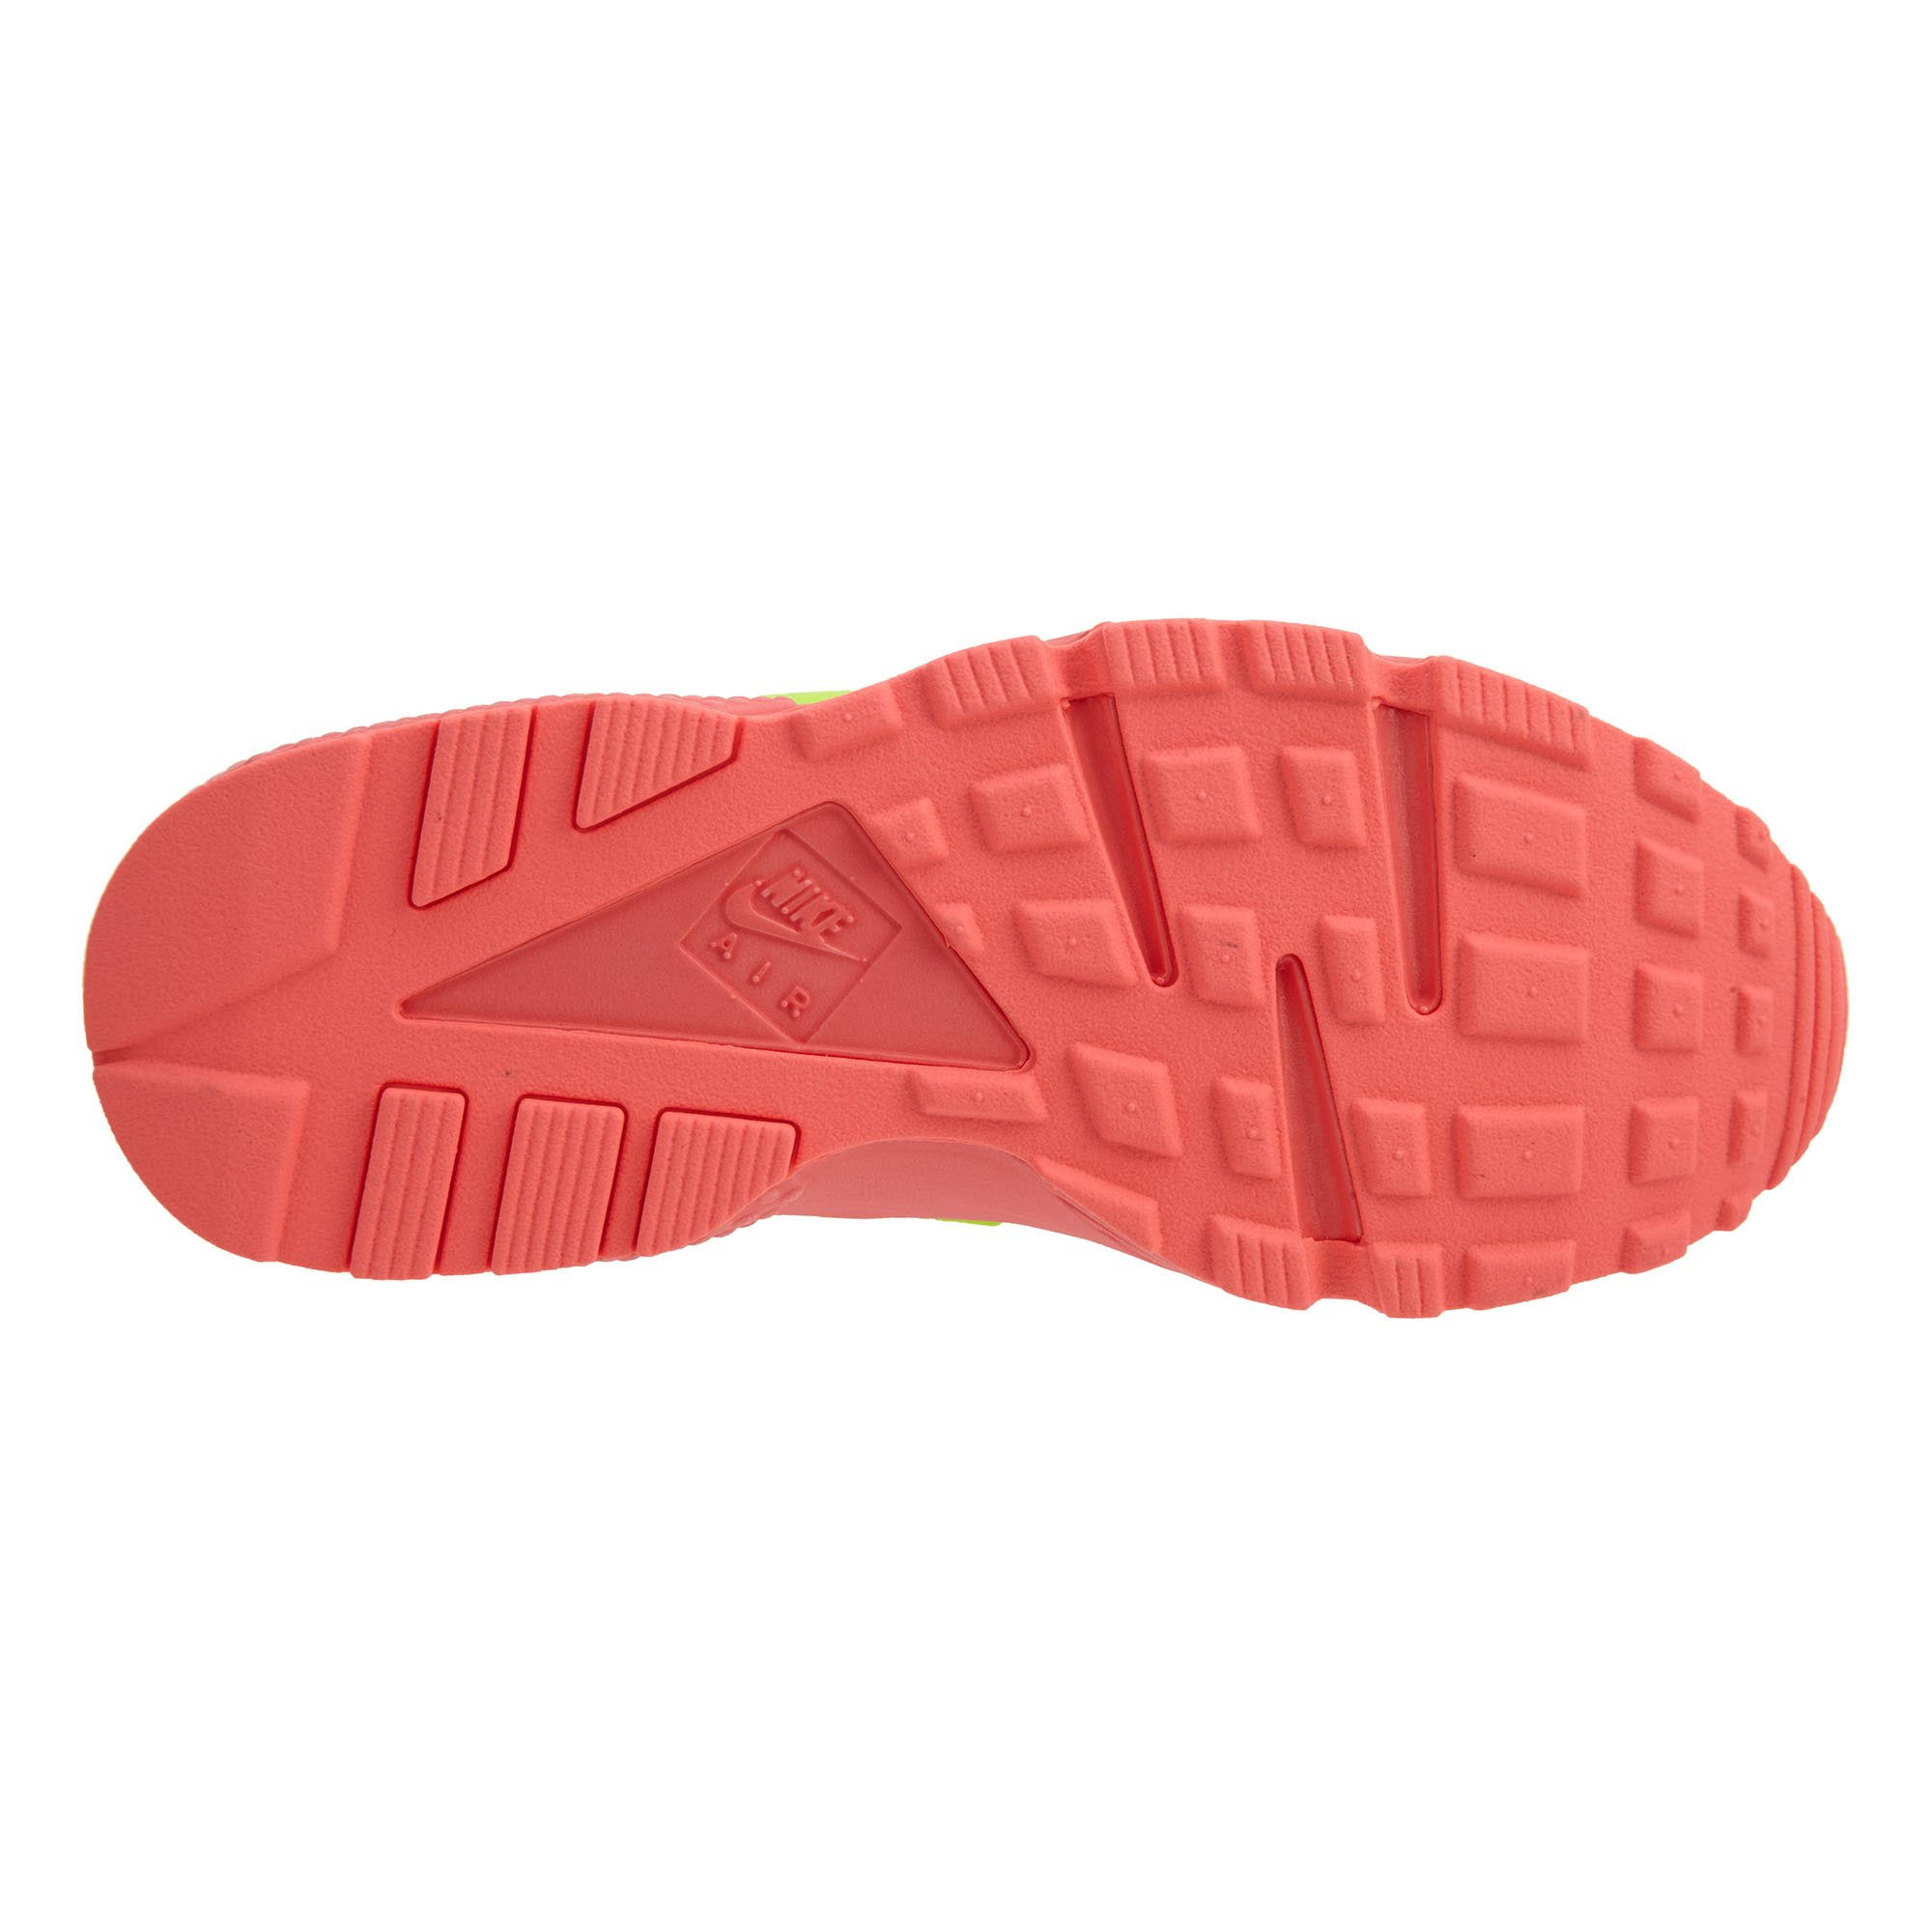 Womens 634835 Huarache Air Size 7 Beige 5 Style Run Nike 5xwXBdtXq